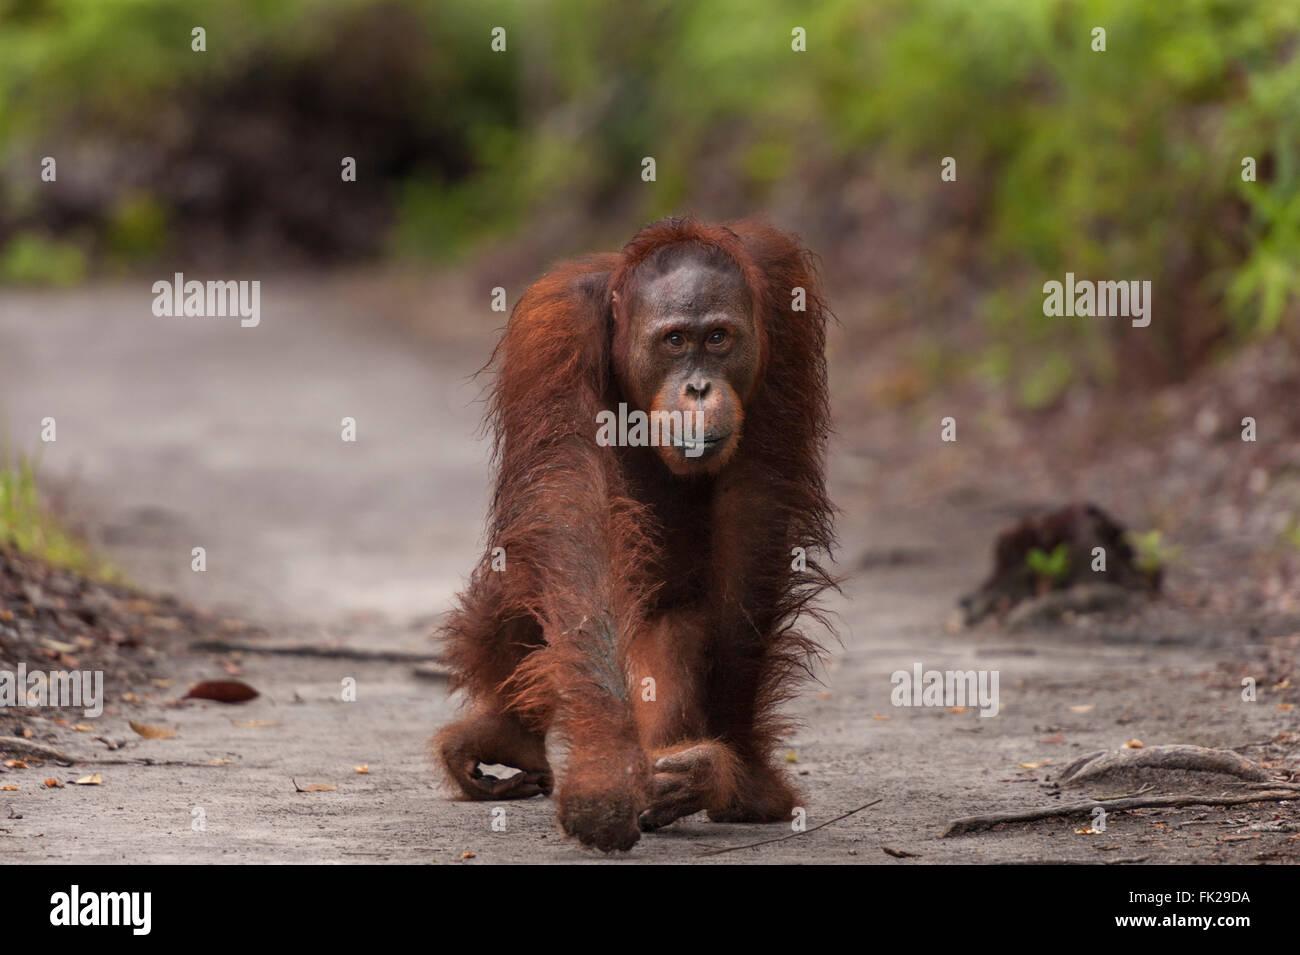 Bornean Orangutan (Pongo pygmaeus wurmbii) - juvenile. - Stock Image